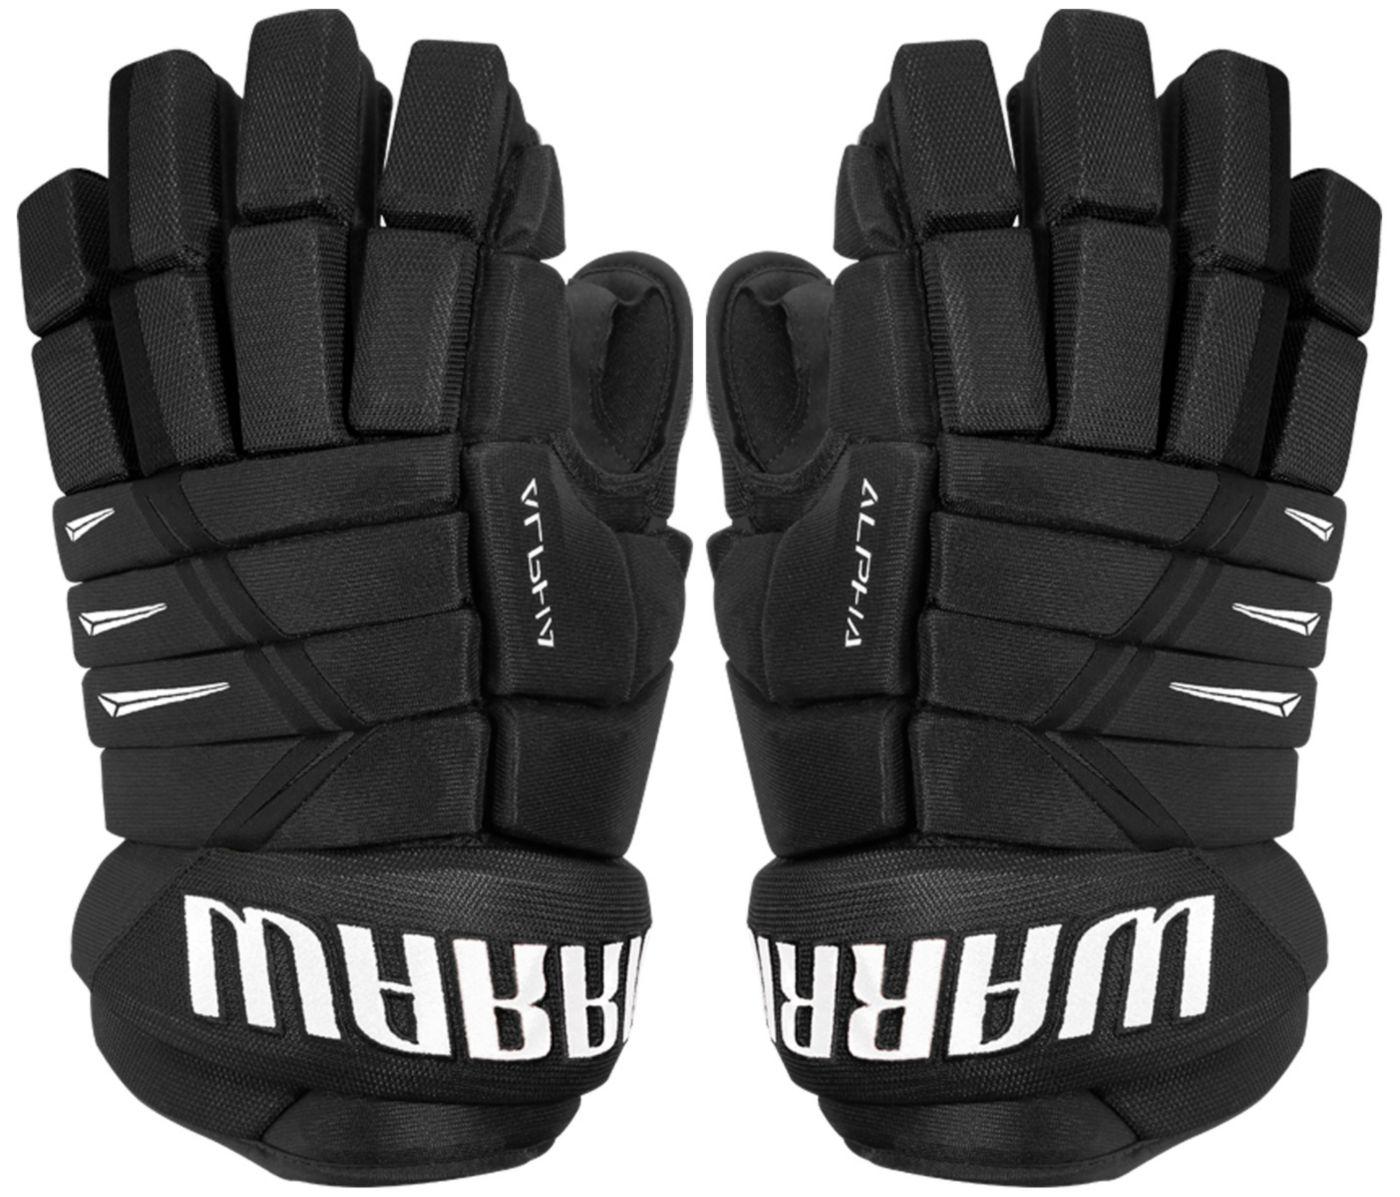 Warrior Youth Alpha DX 3 Ice Hockey Gloves